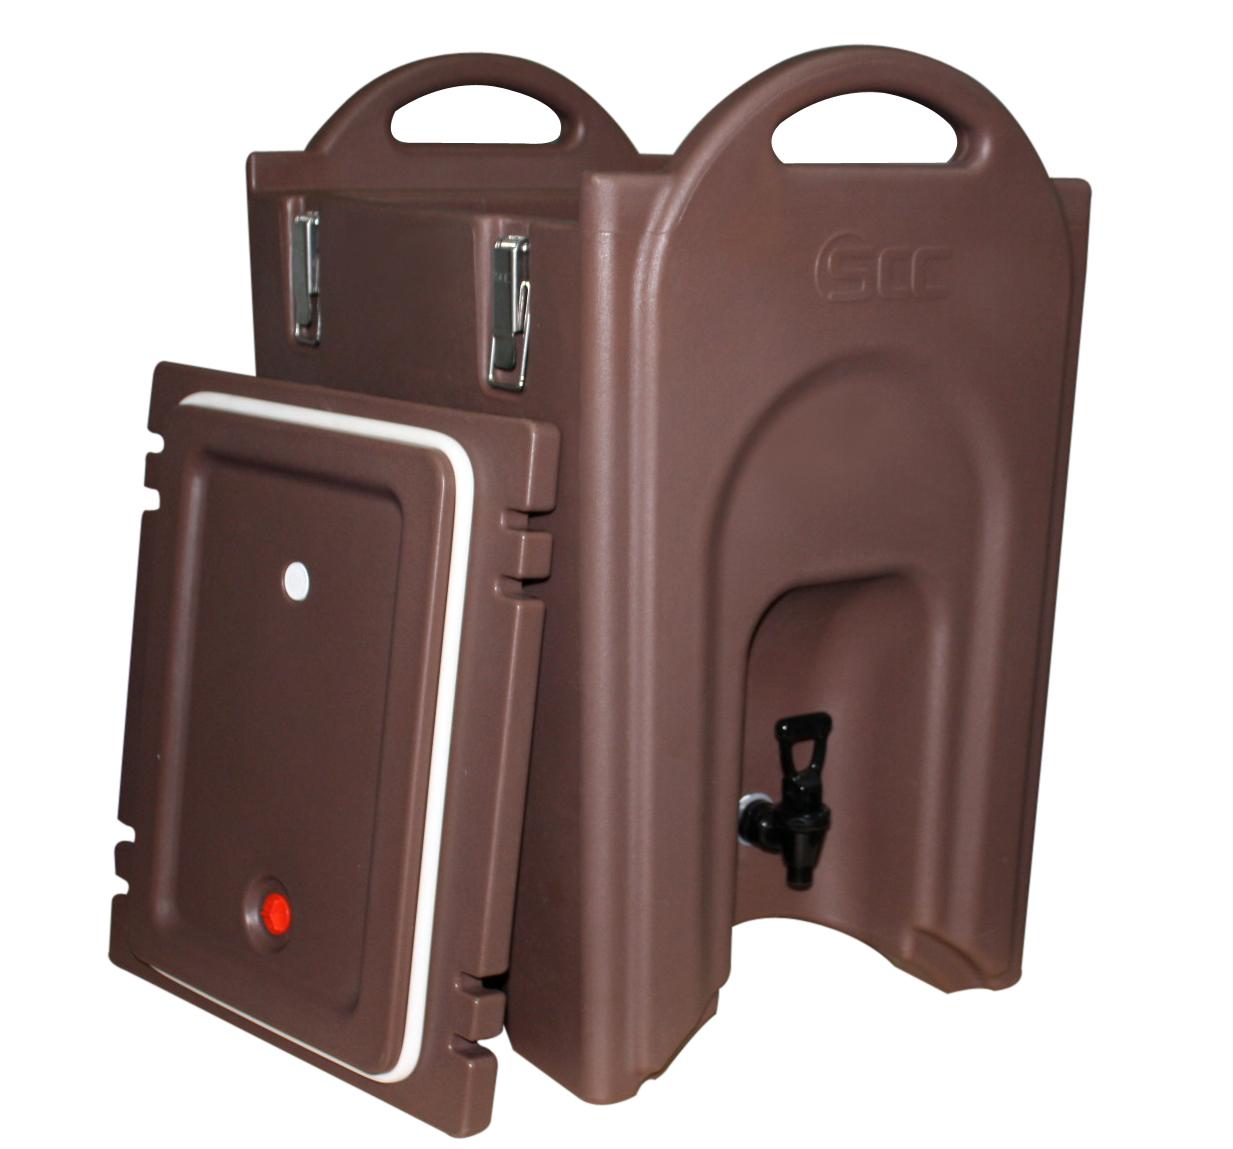 40L Beverage dispenser SB3-A40